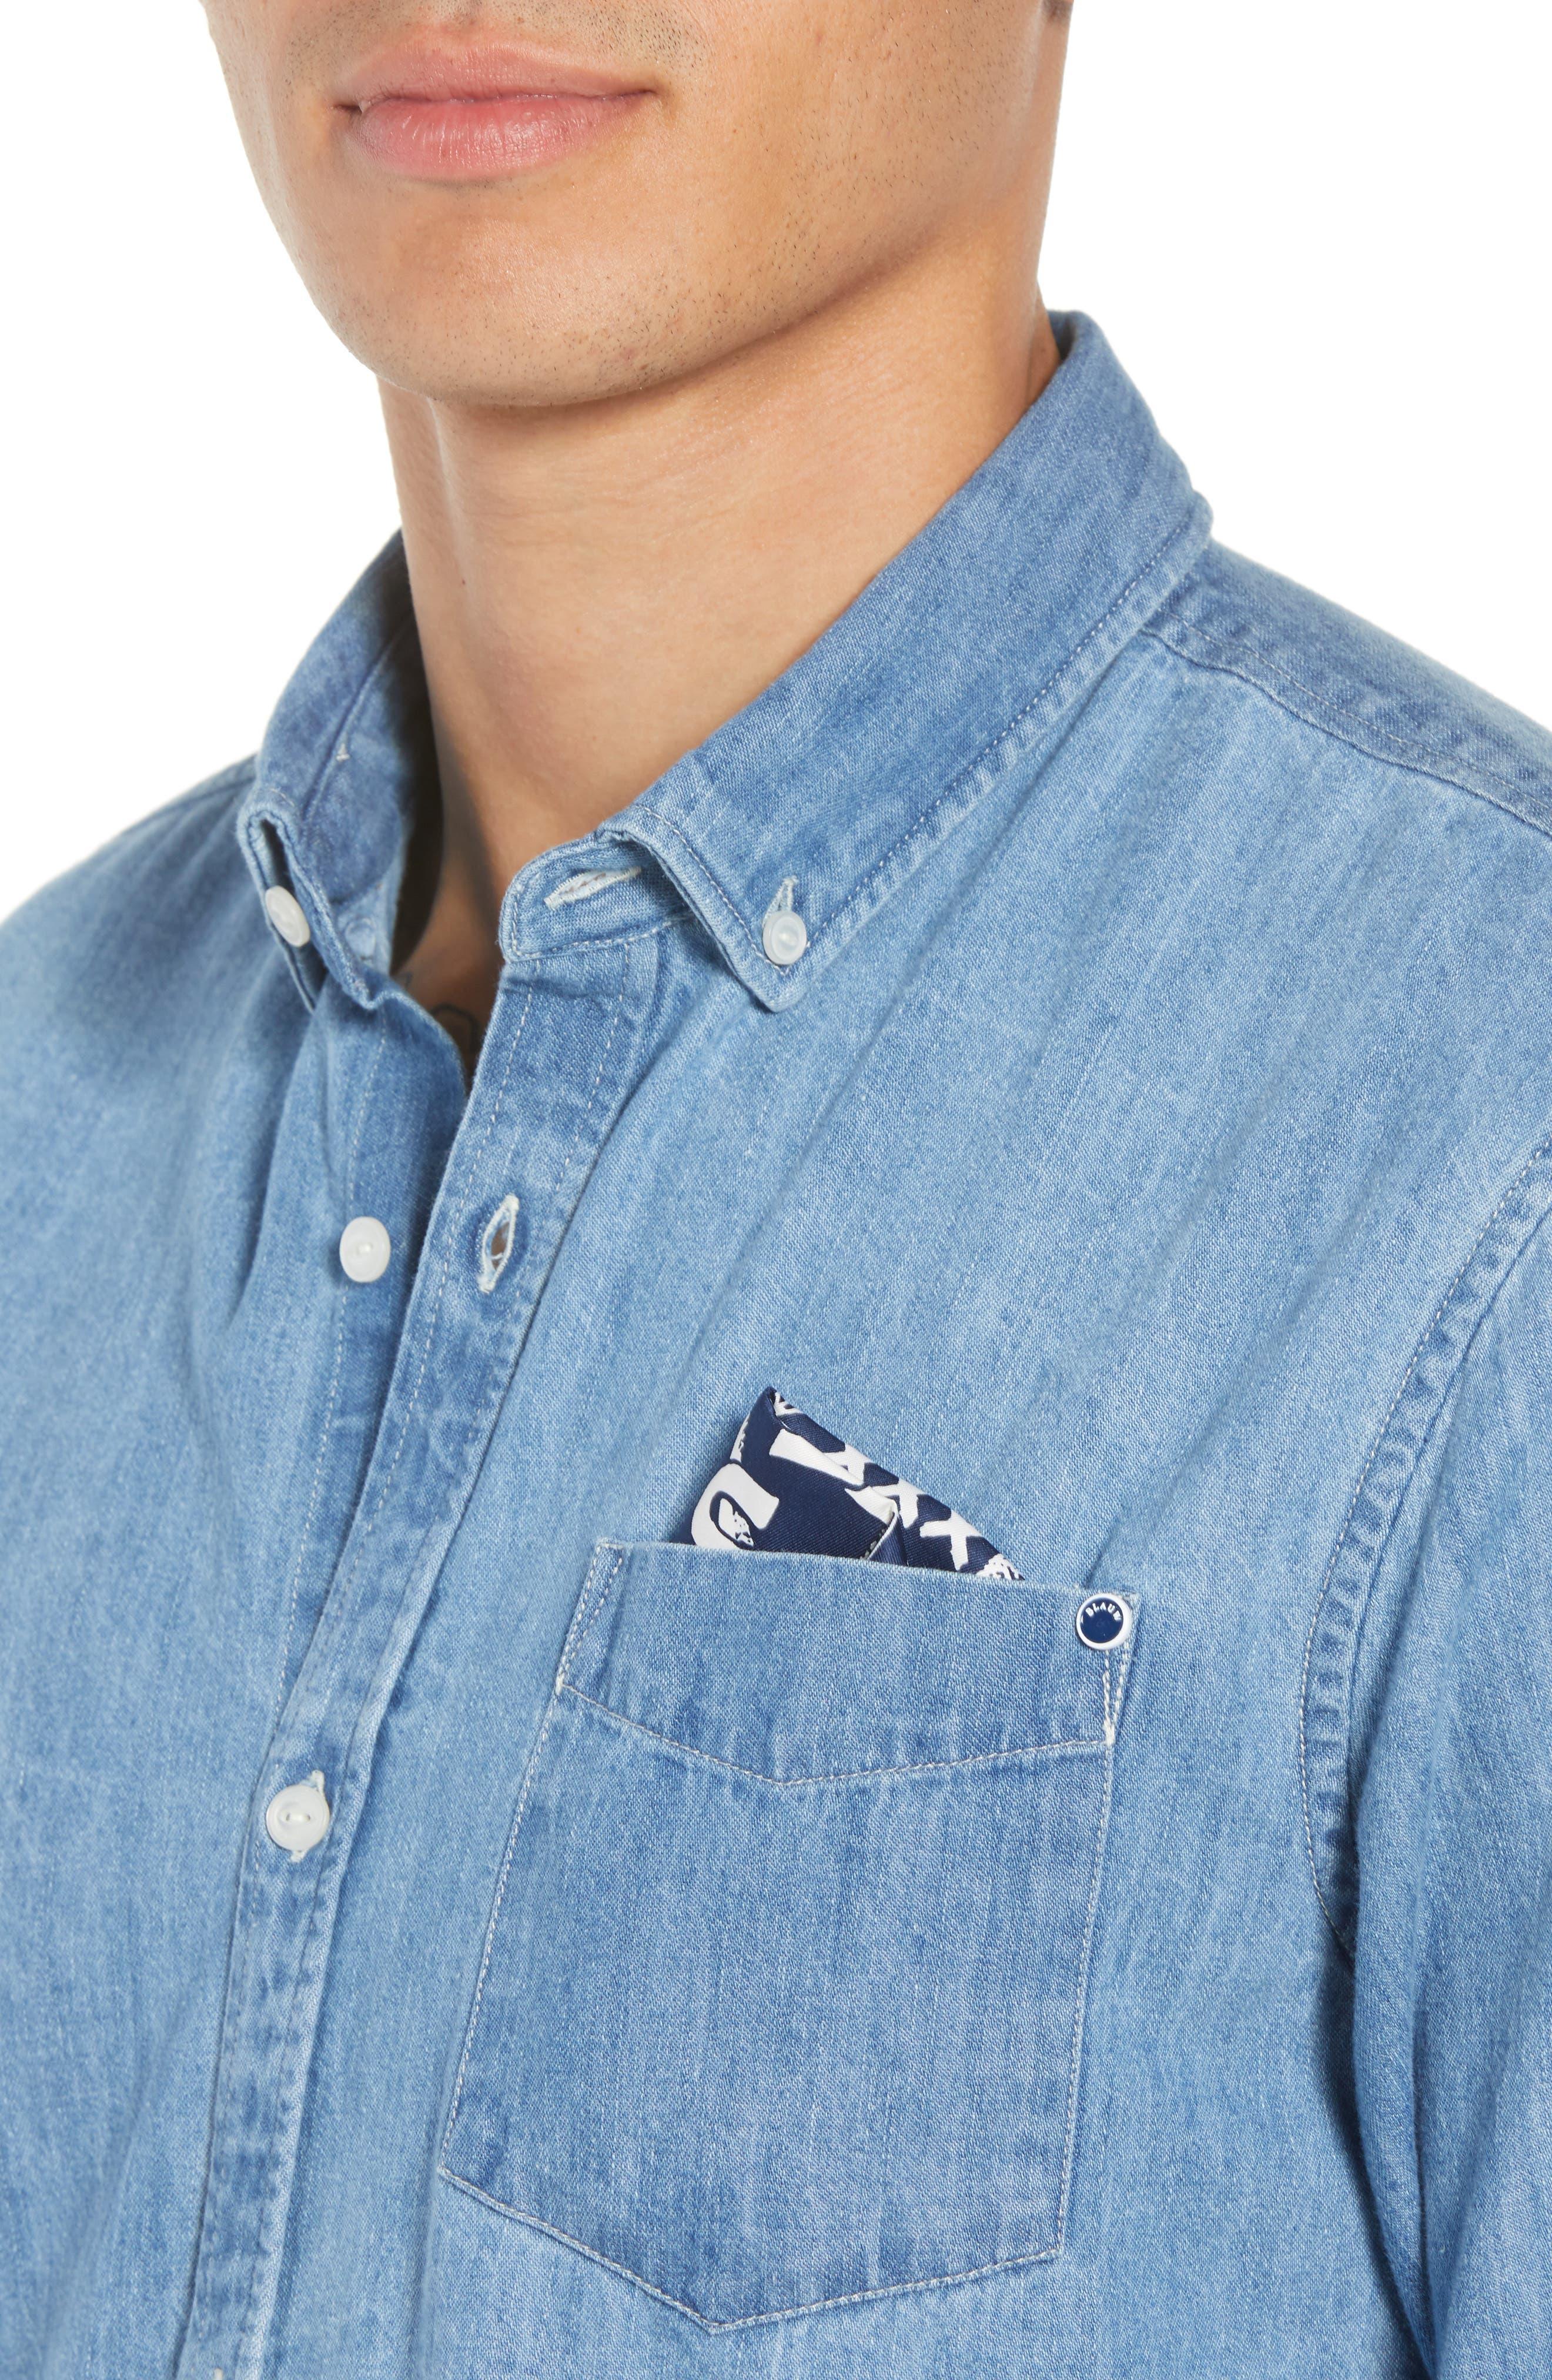 Amsterdams Blauw Pocket Square Chambray Sport Shirt,                             Alternate thumbnail 4, color,                             DENIM BLUE